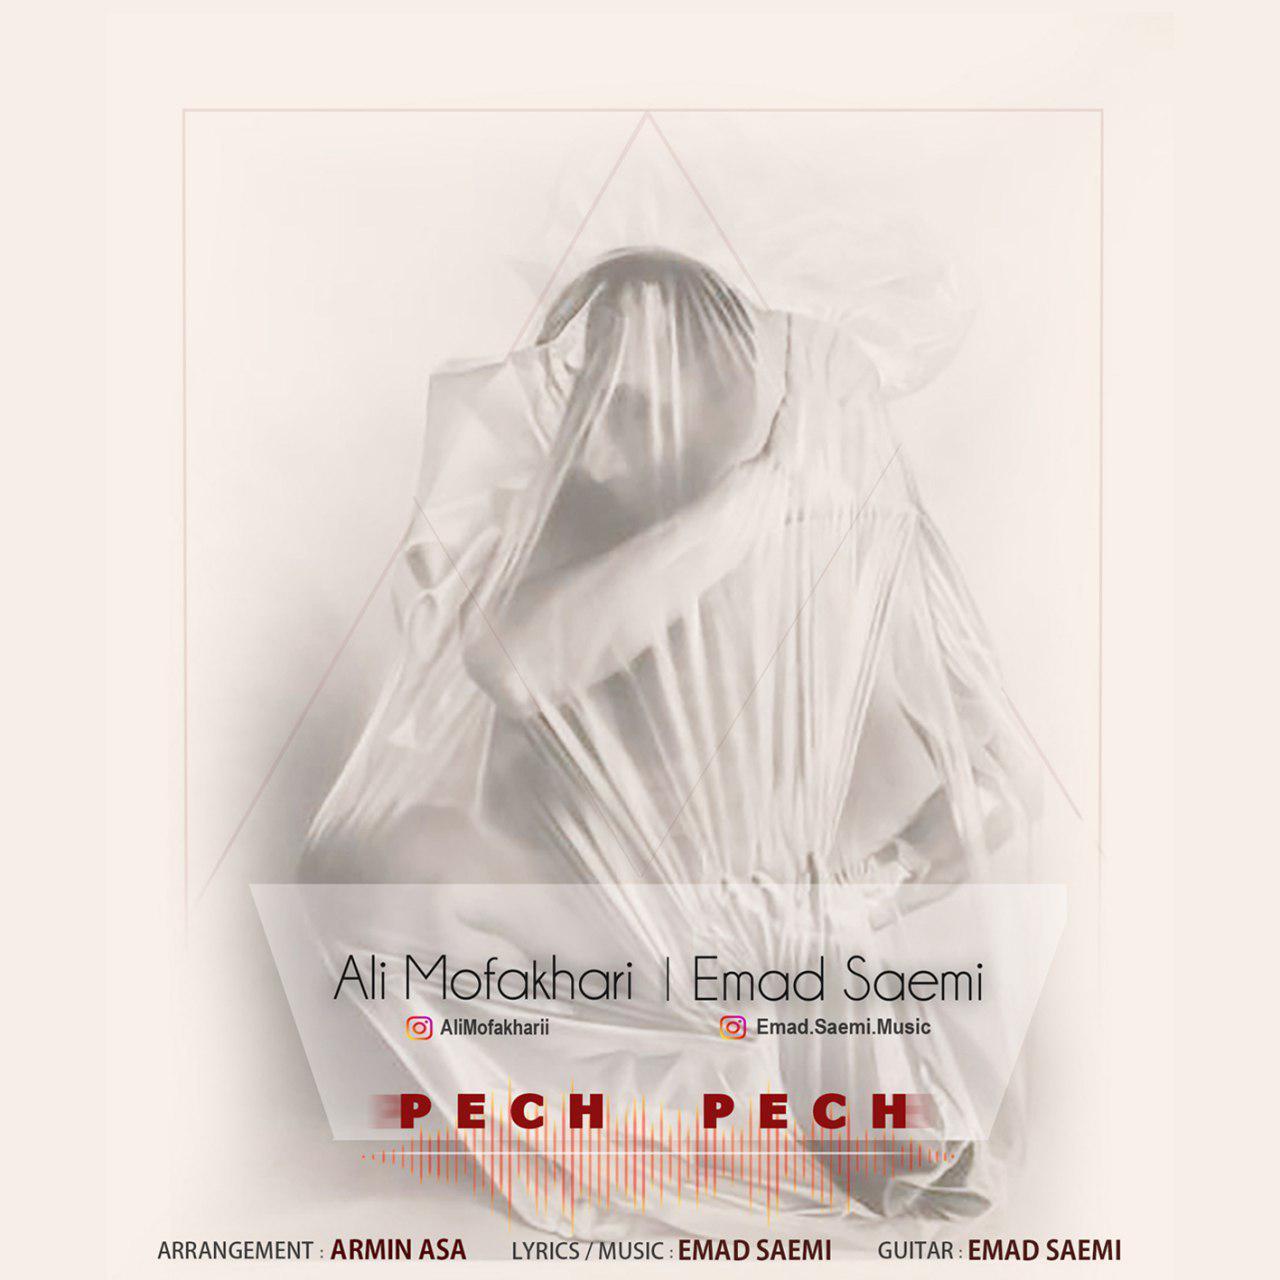 Emad Saemi - Pech Pech Music | آهنگ عماد صائمی و علی مفخری - پچ پچ